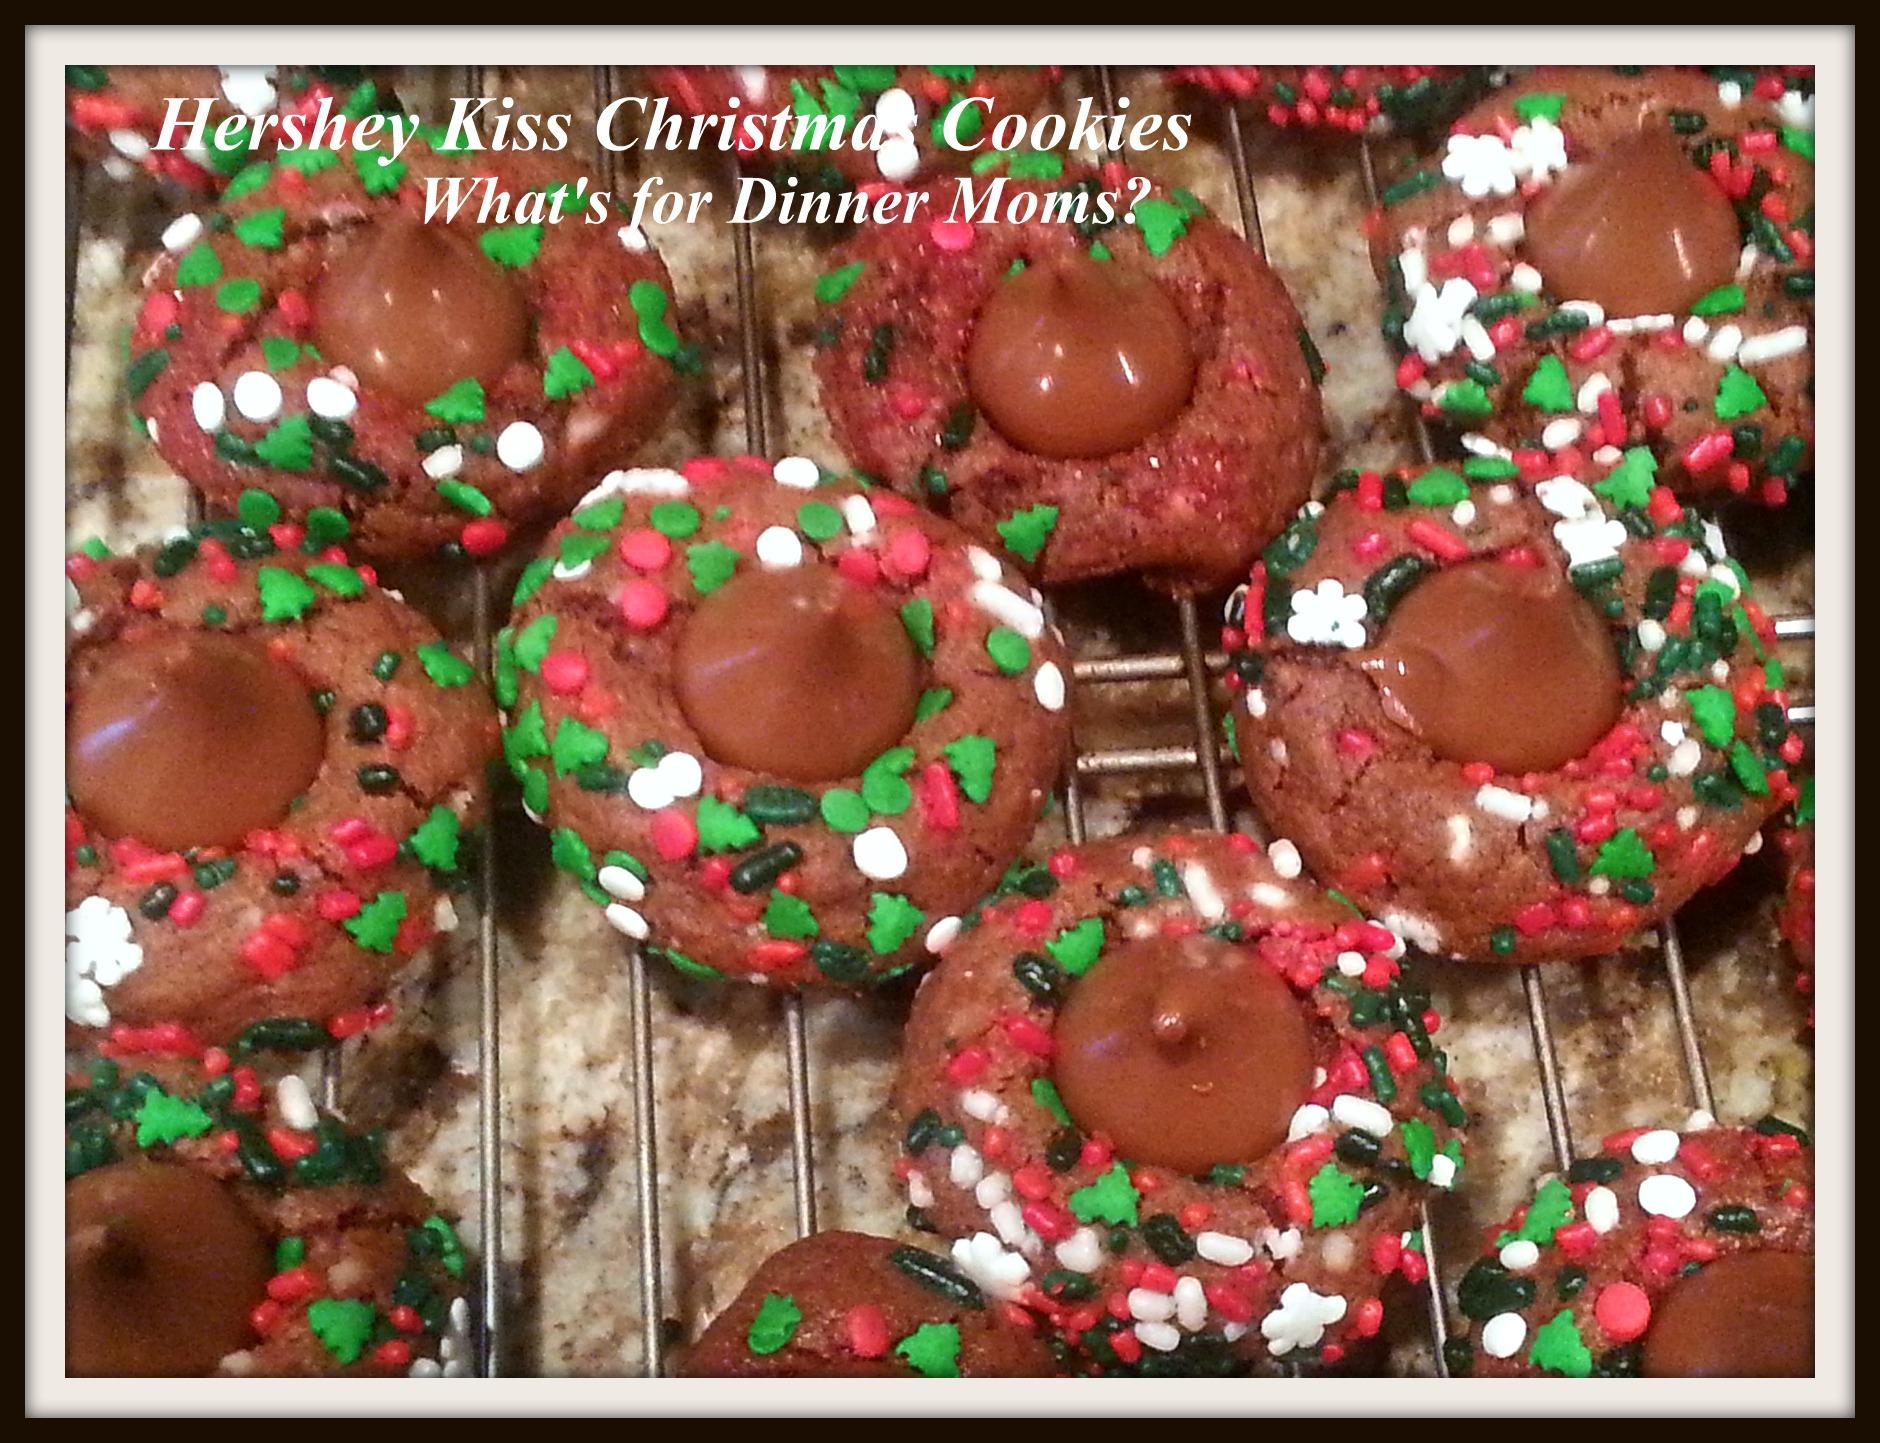 Hershey Kiss Christmas Cookies